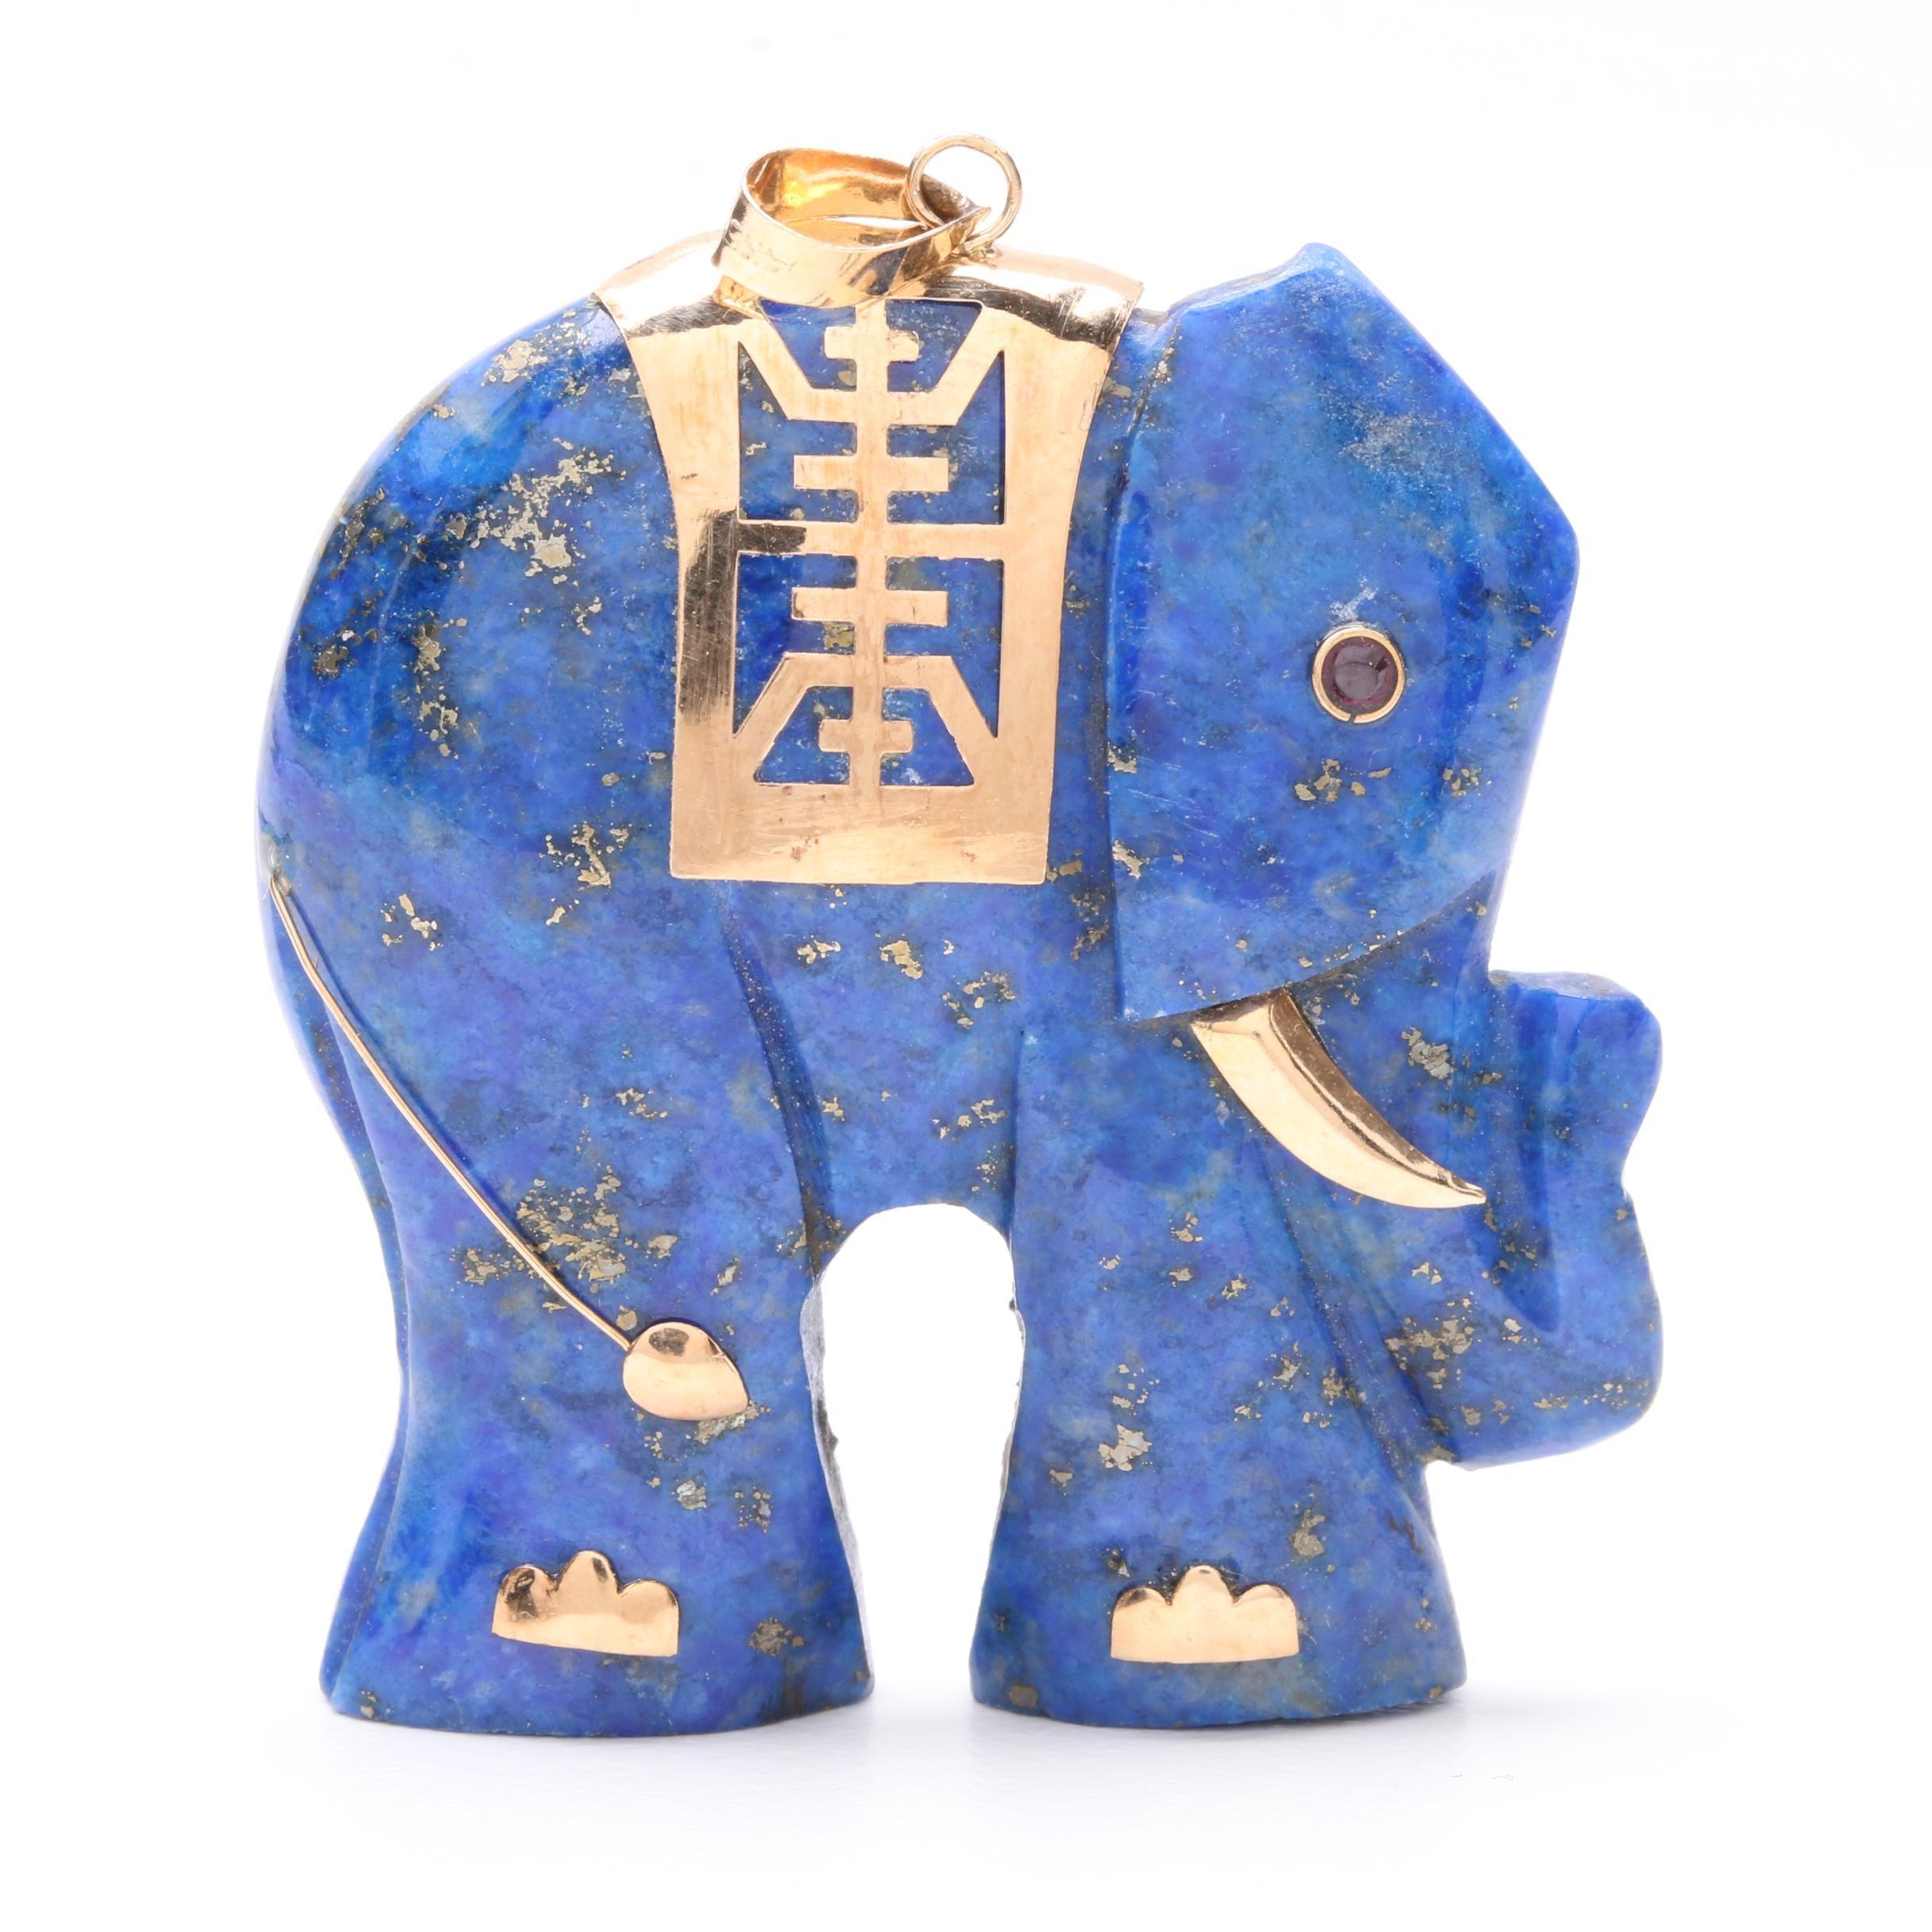 14K Yellow Gold Lapis Lazuli and Ruby Elephant Pendant